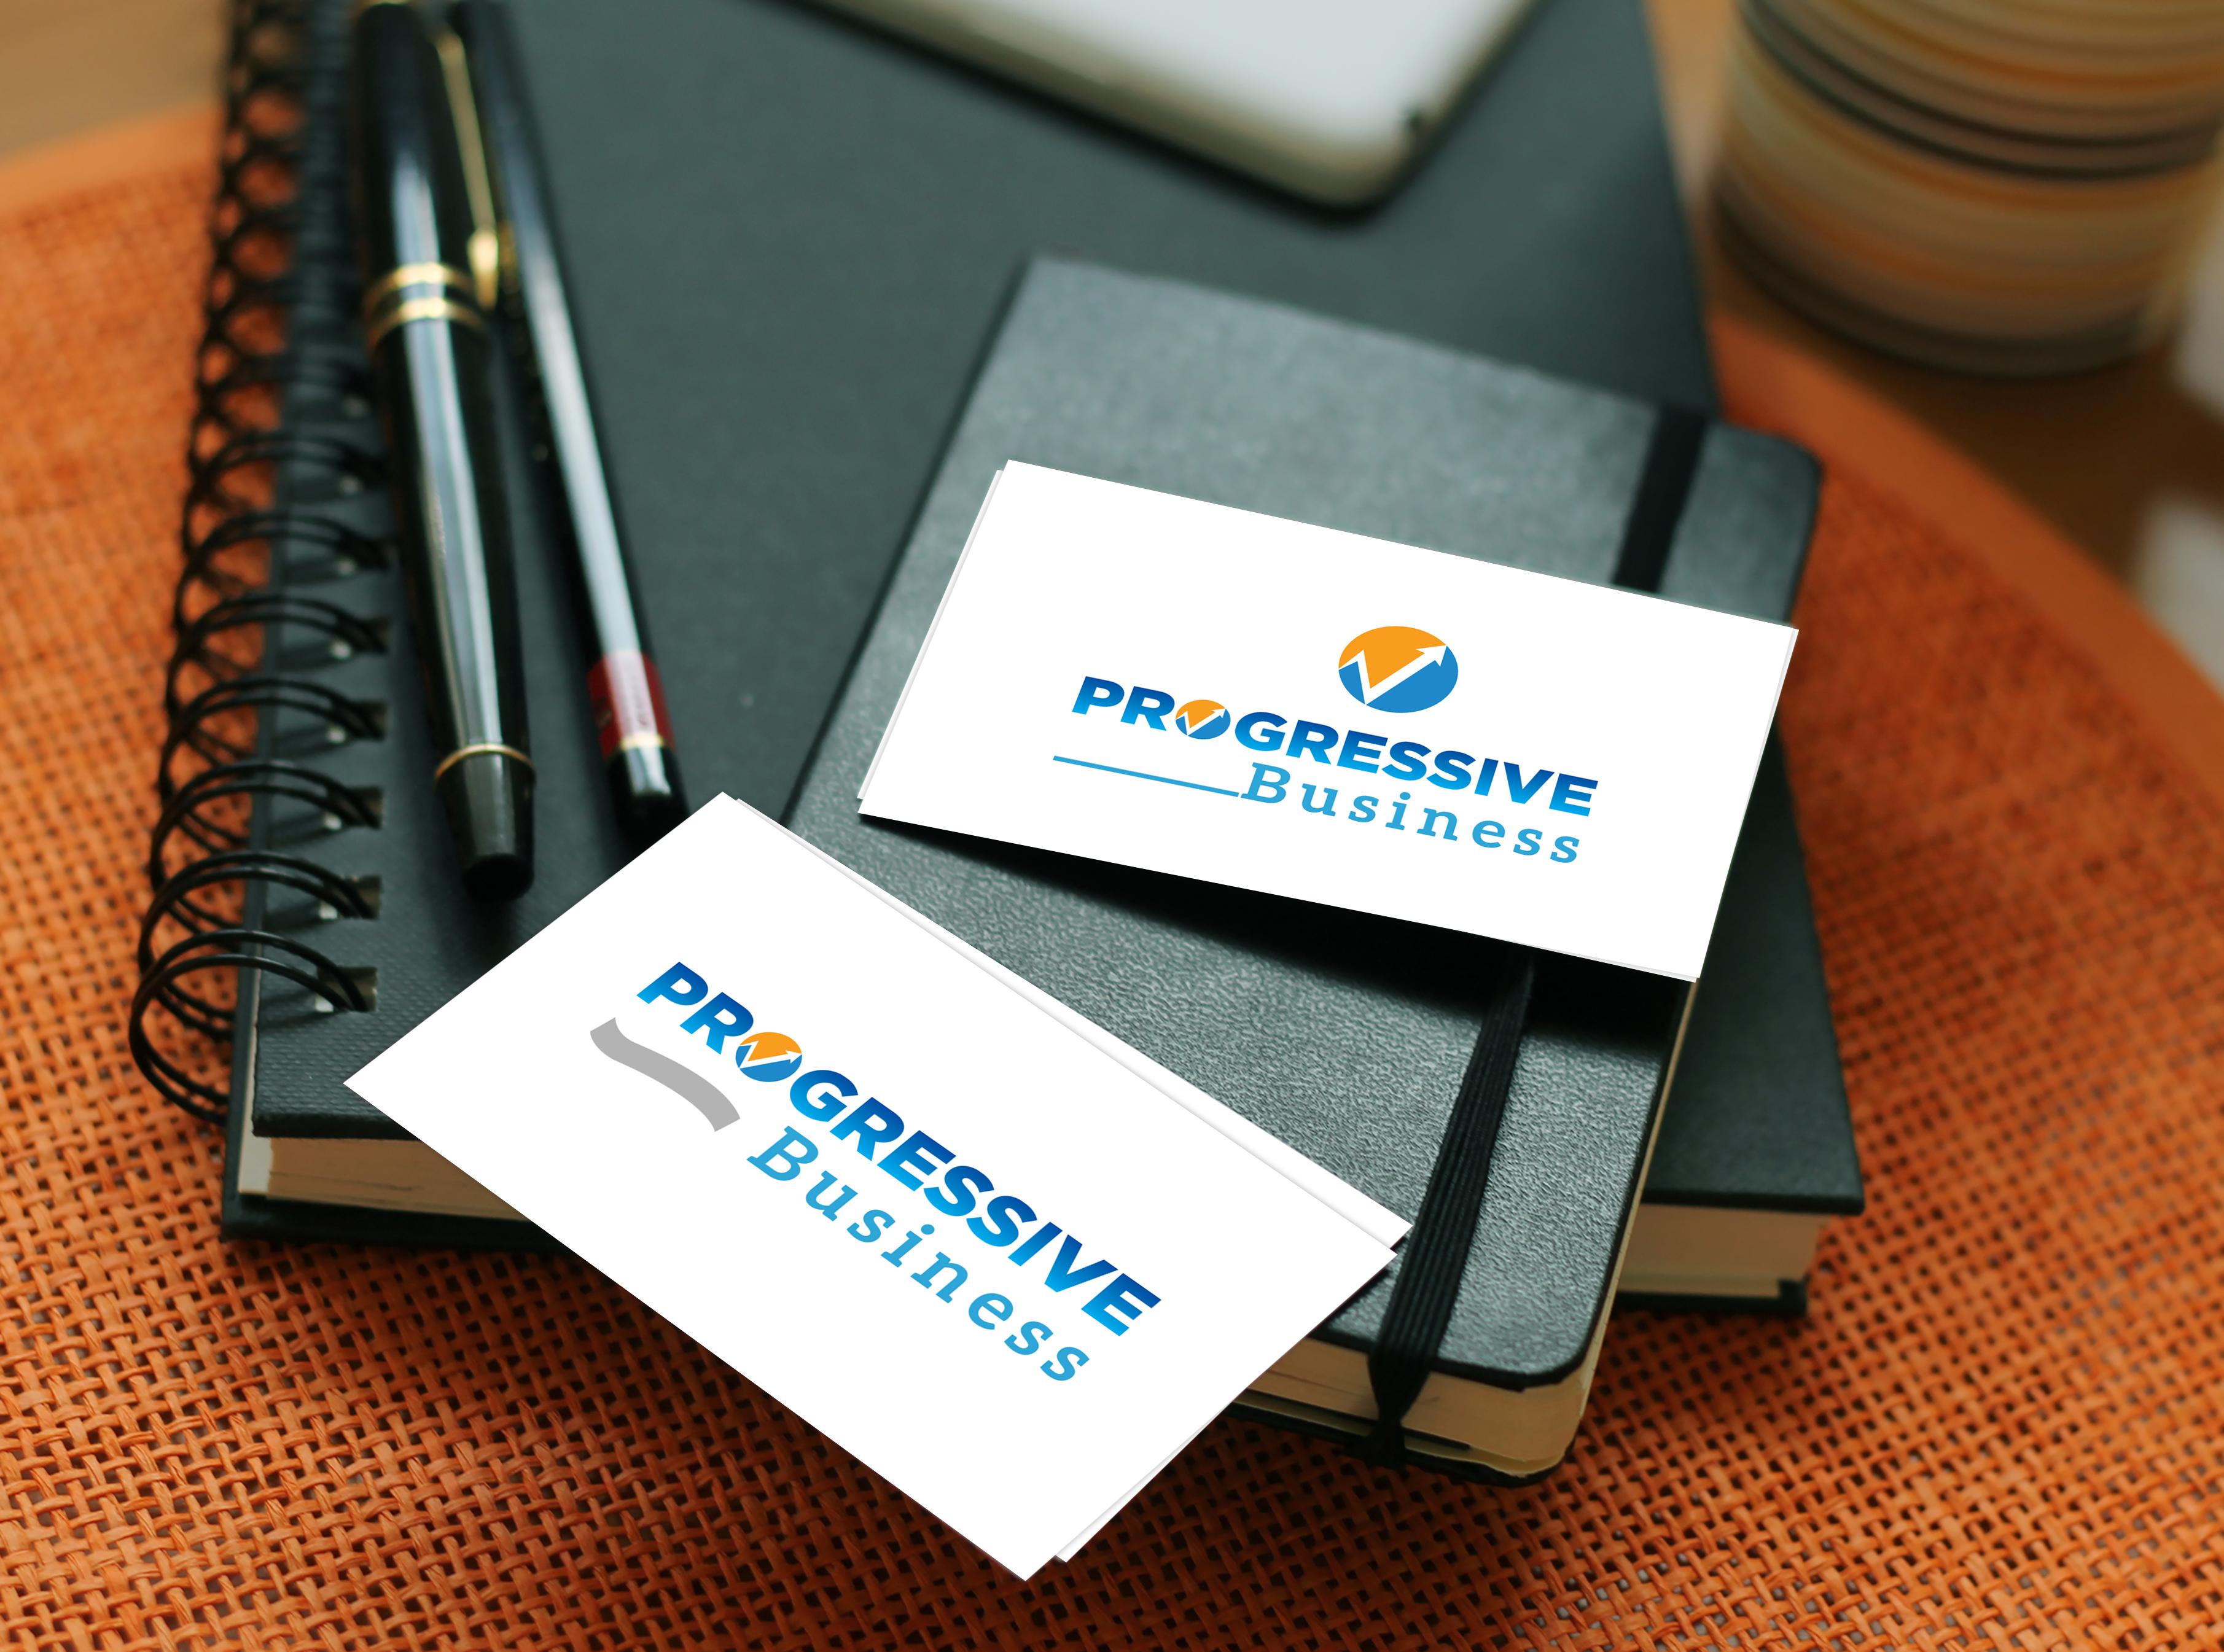 Logo Design by Bac Huu - Entry No. 197 in the Logo Design Contest Captivating Logo Design for Progressive Business.